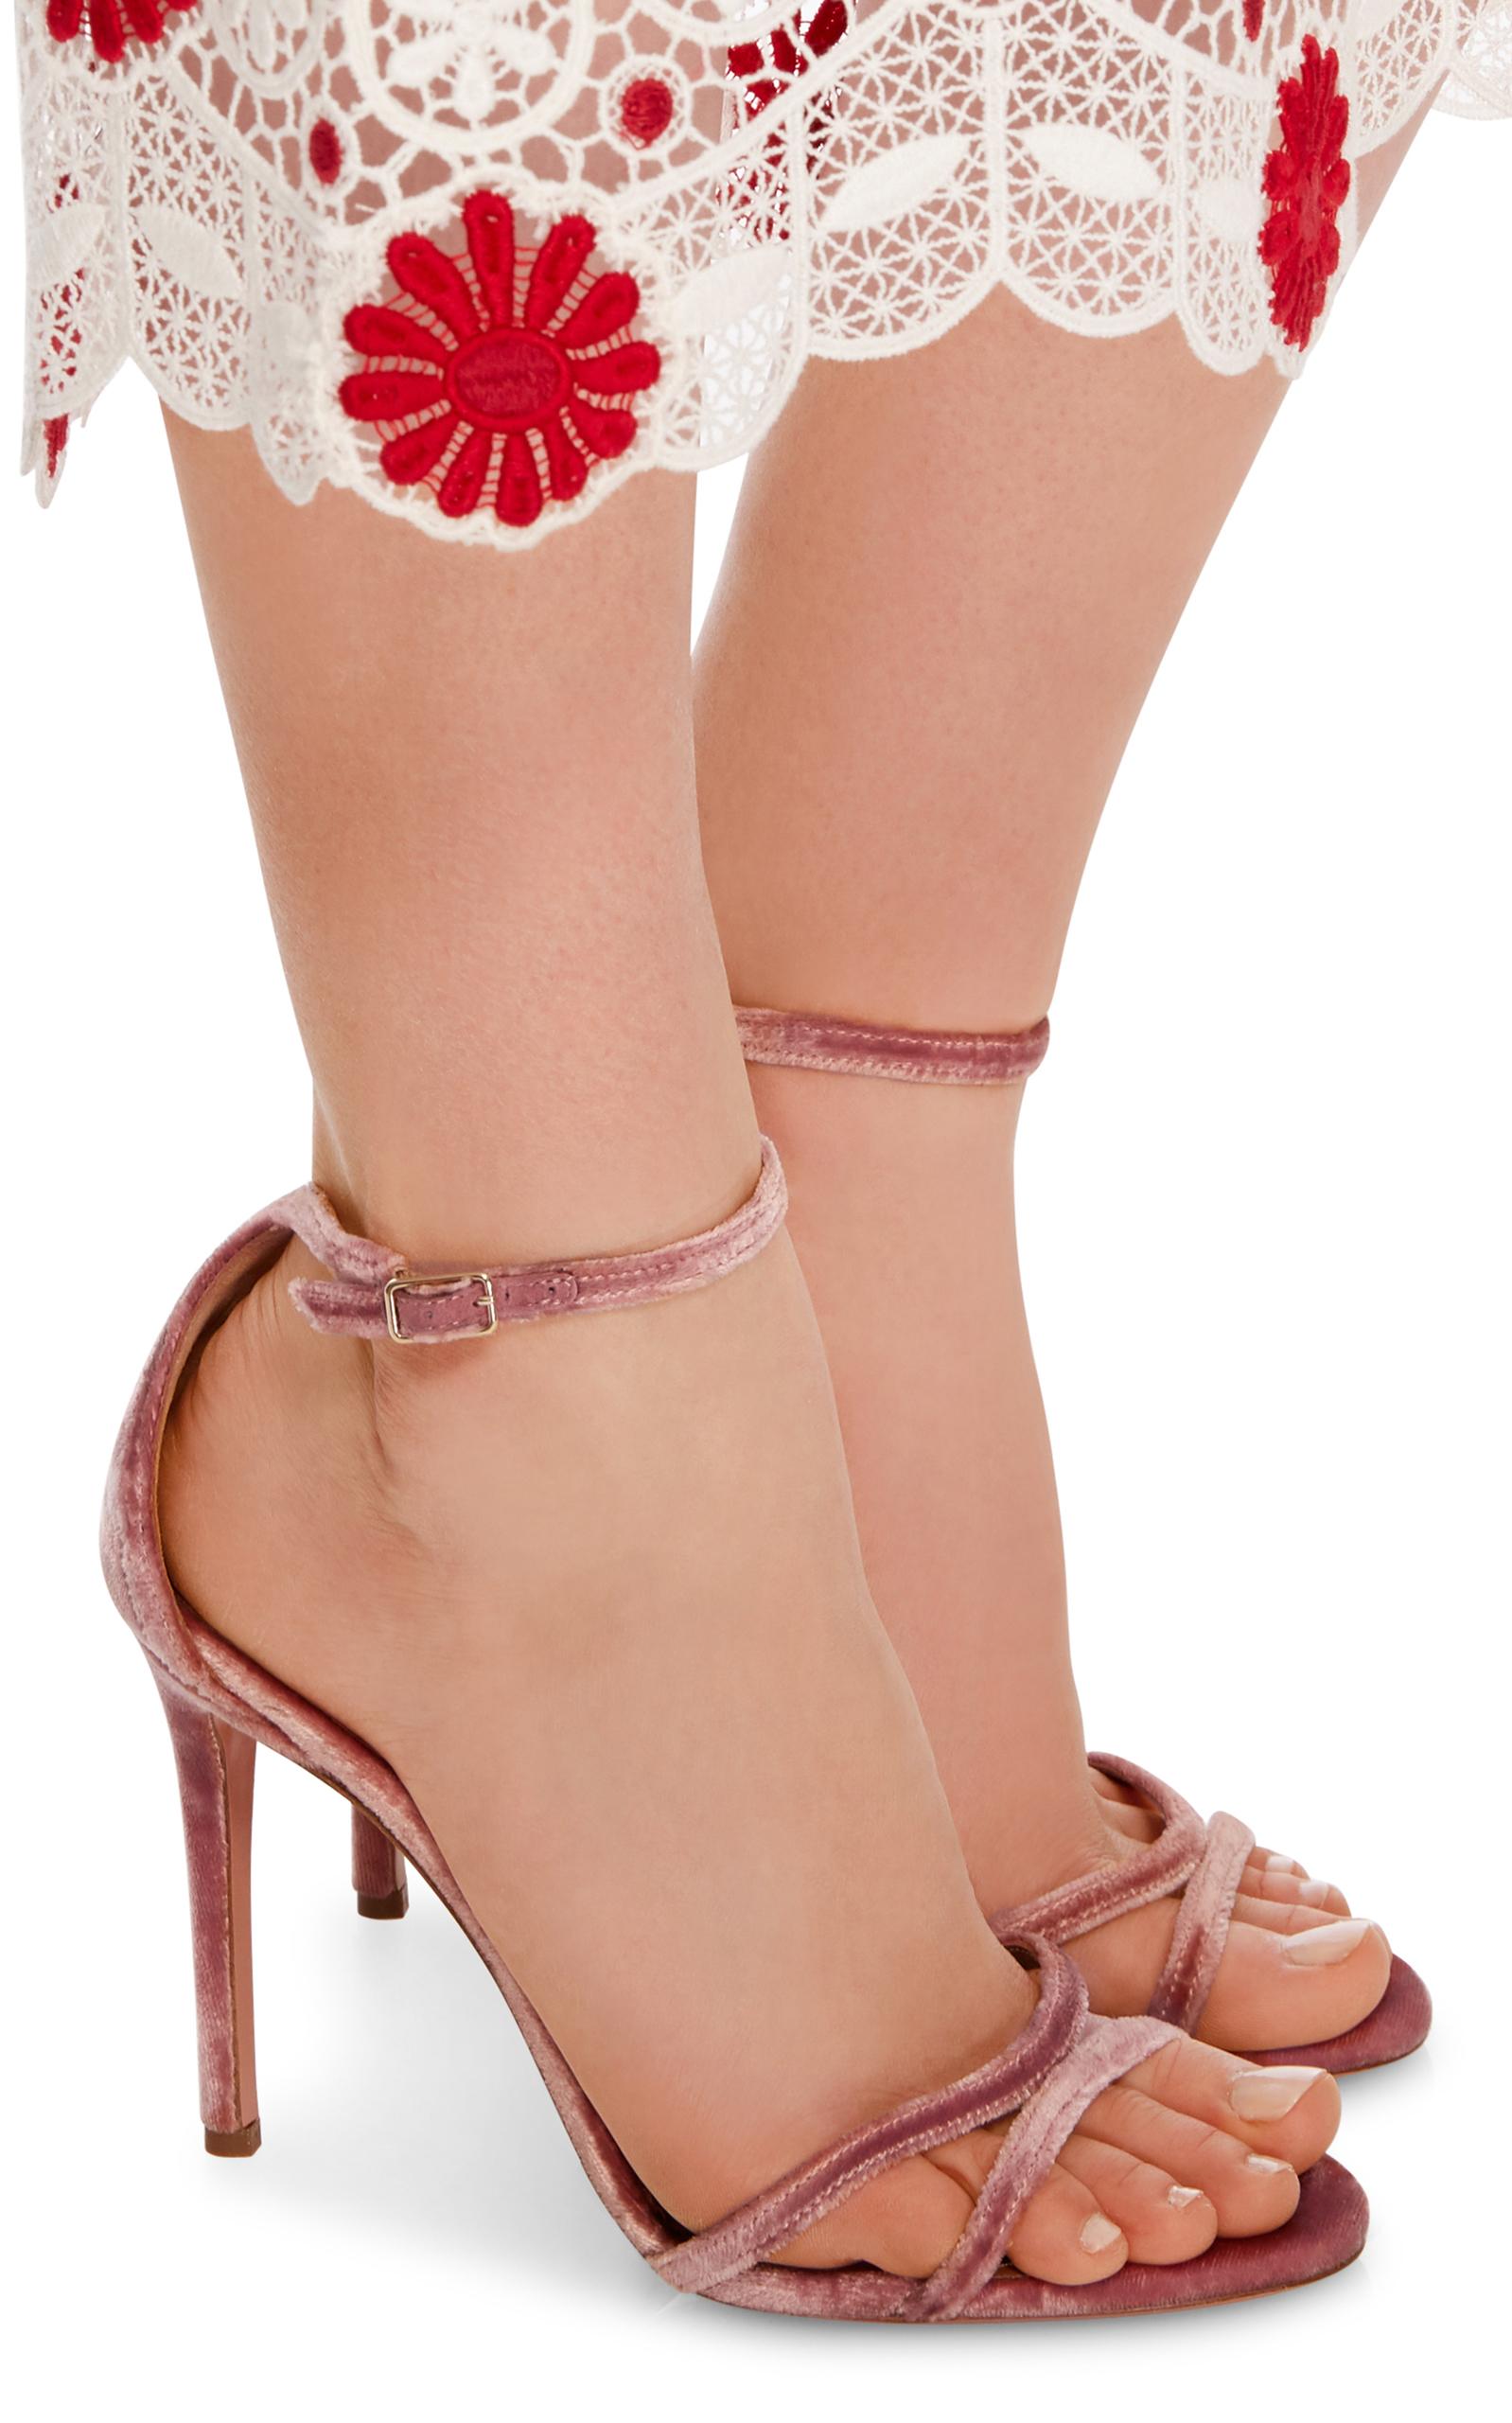 ... Evening; Purist Velvet Sandals. CLOSE. Loading